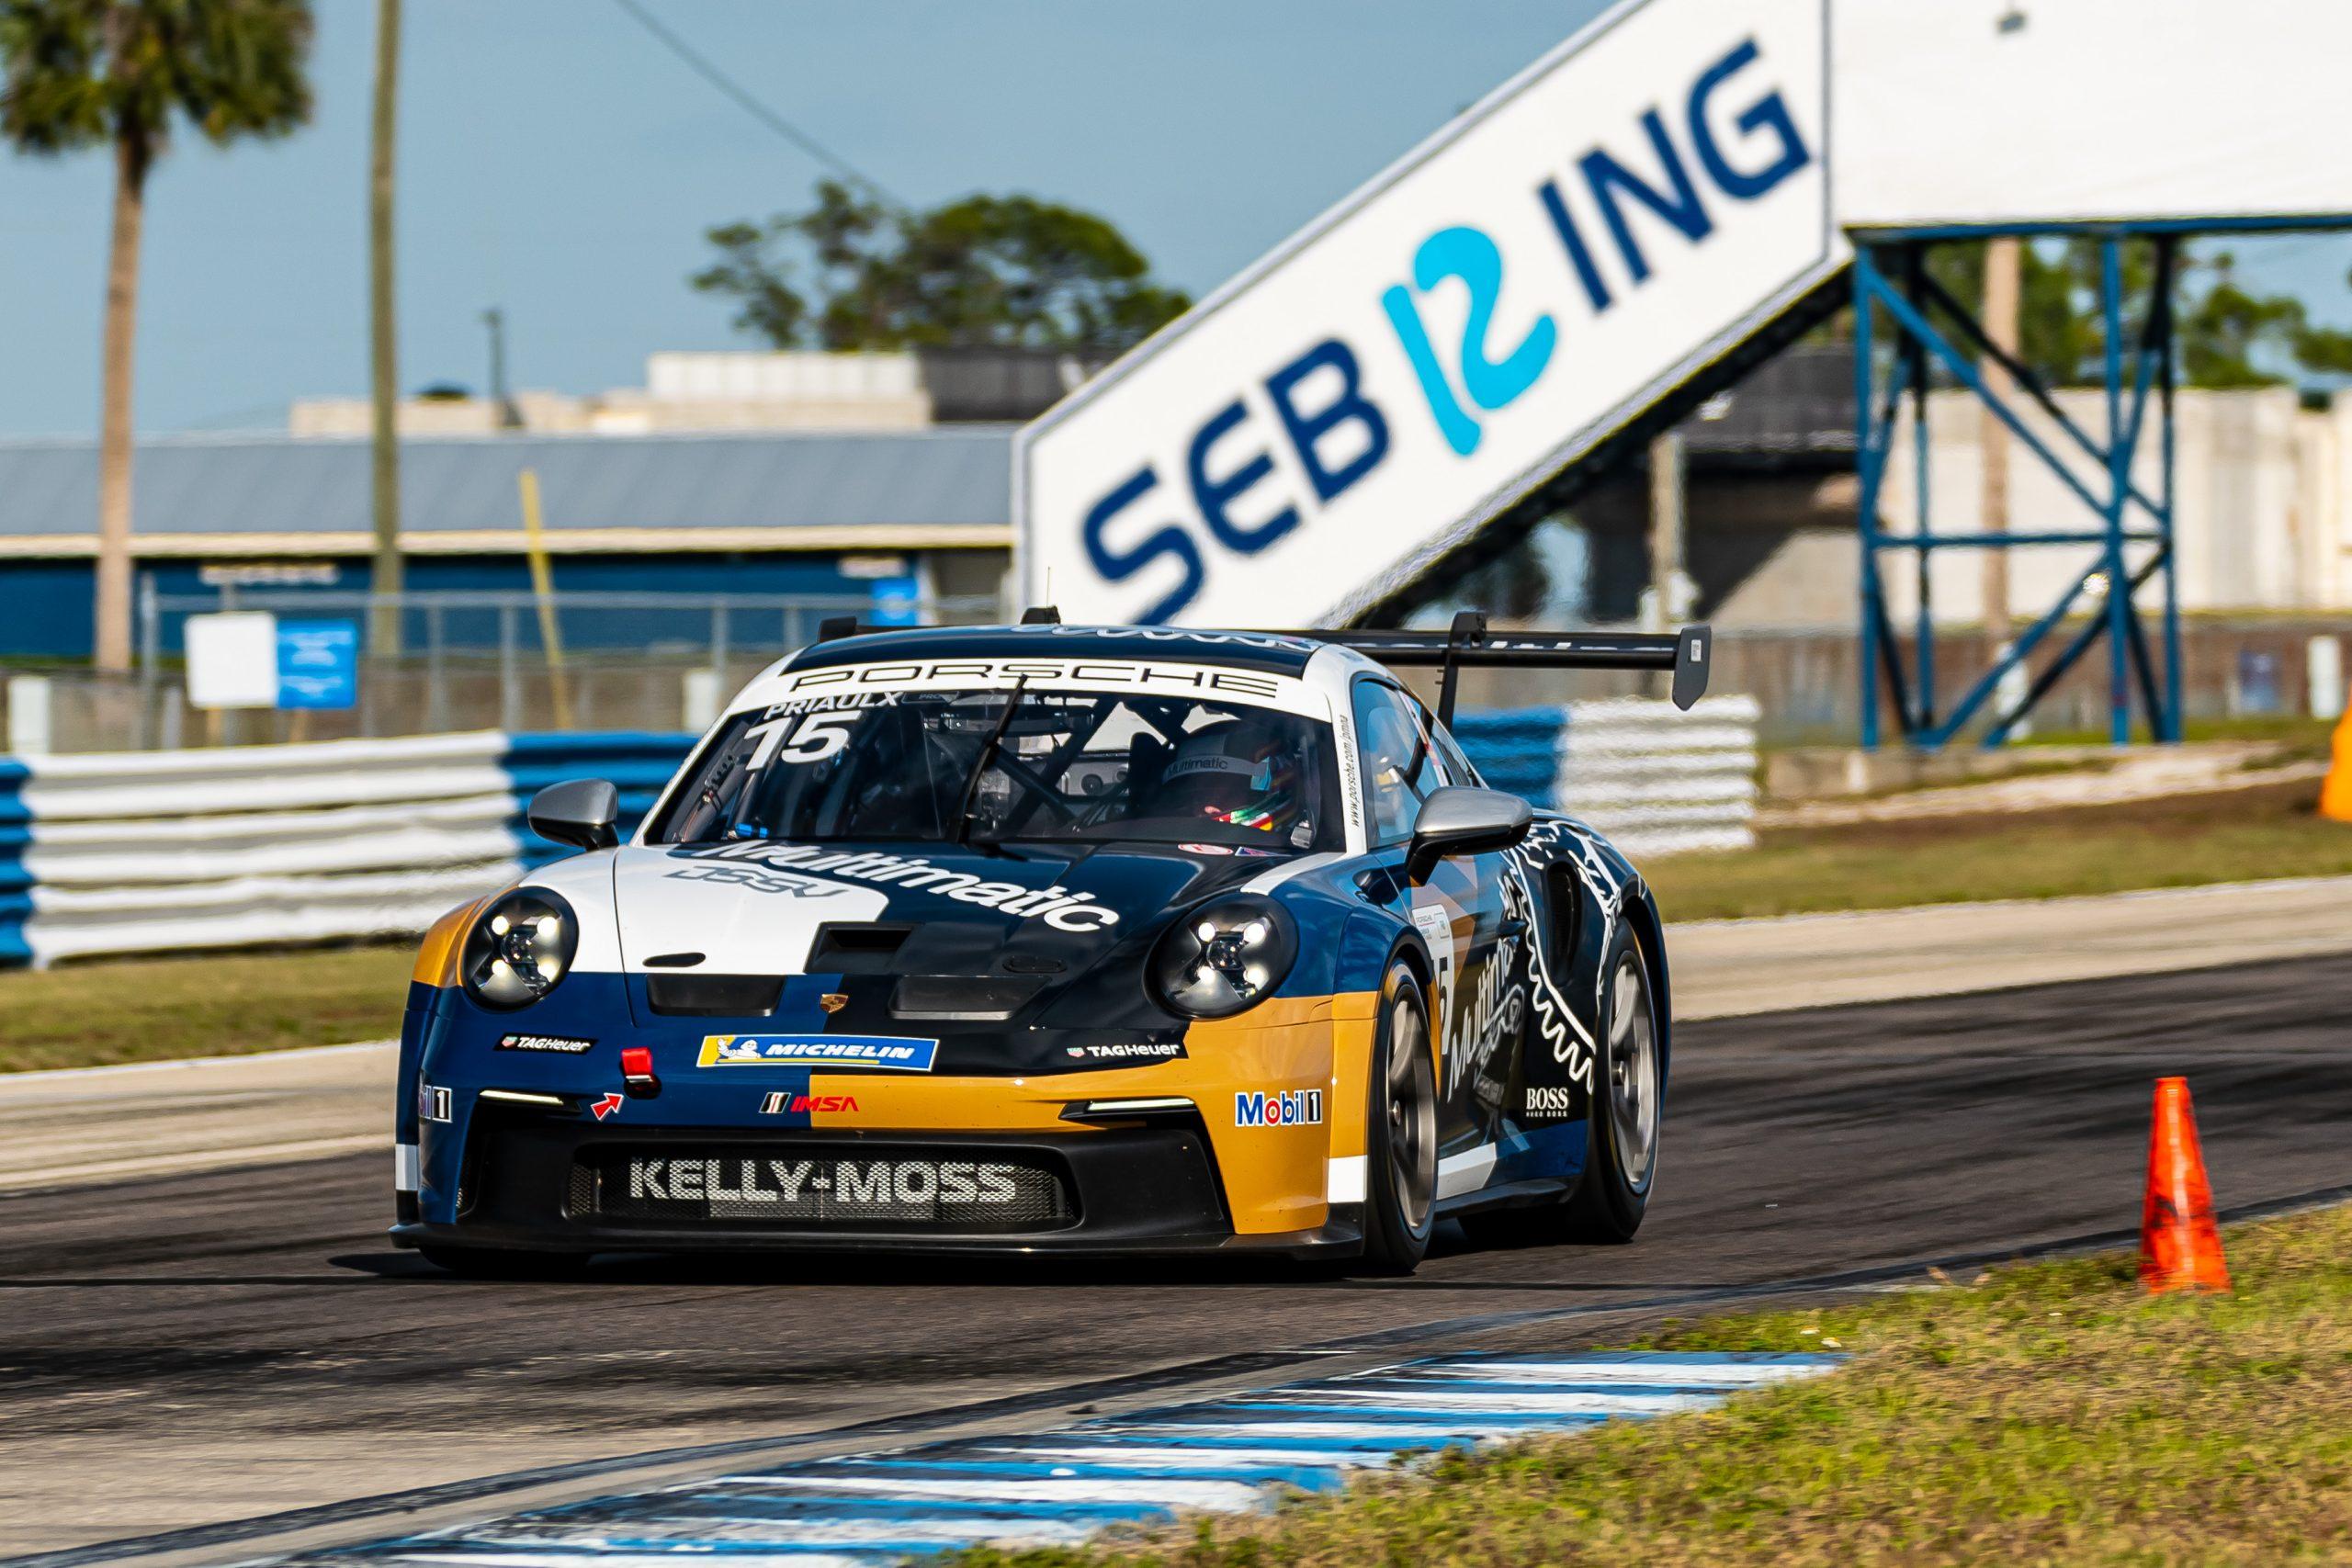 No. 15 Kelly-Moss Road & Race, Porsche 911 GT3 Cup, Sebastian Priaulx